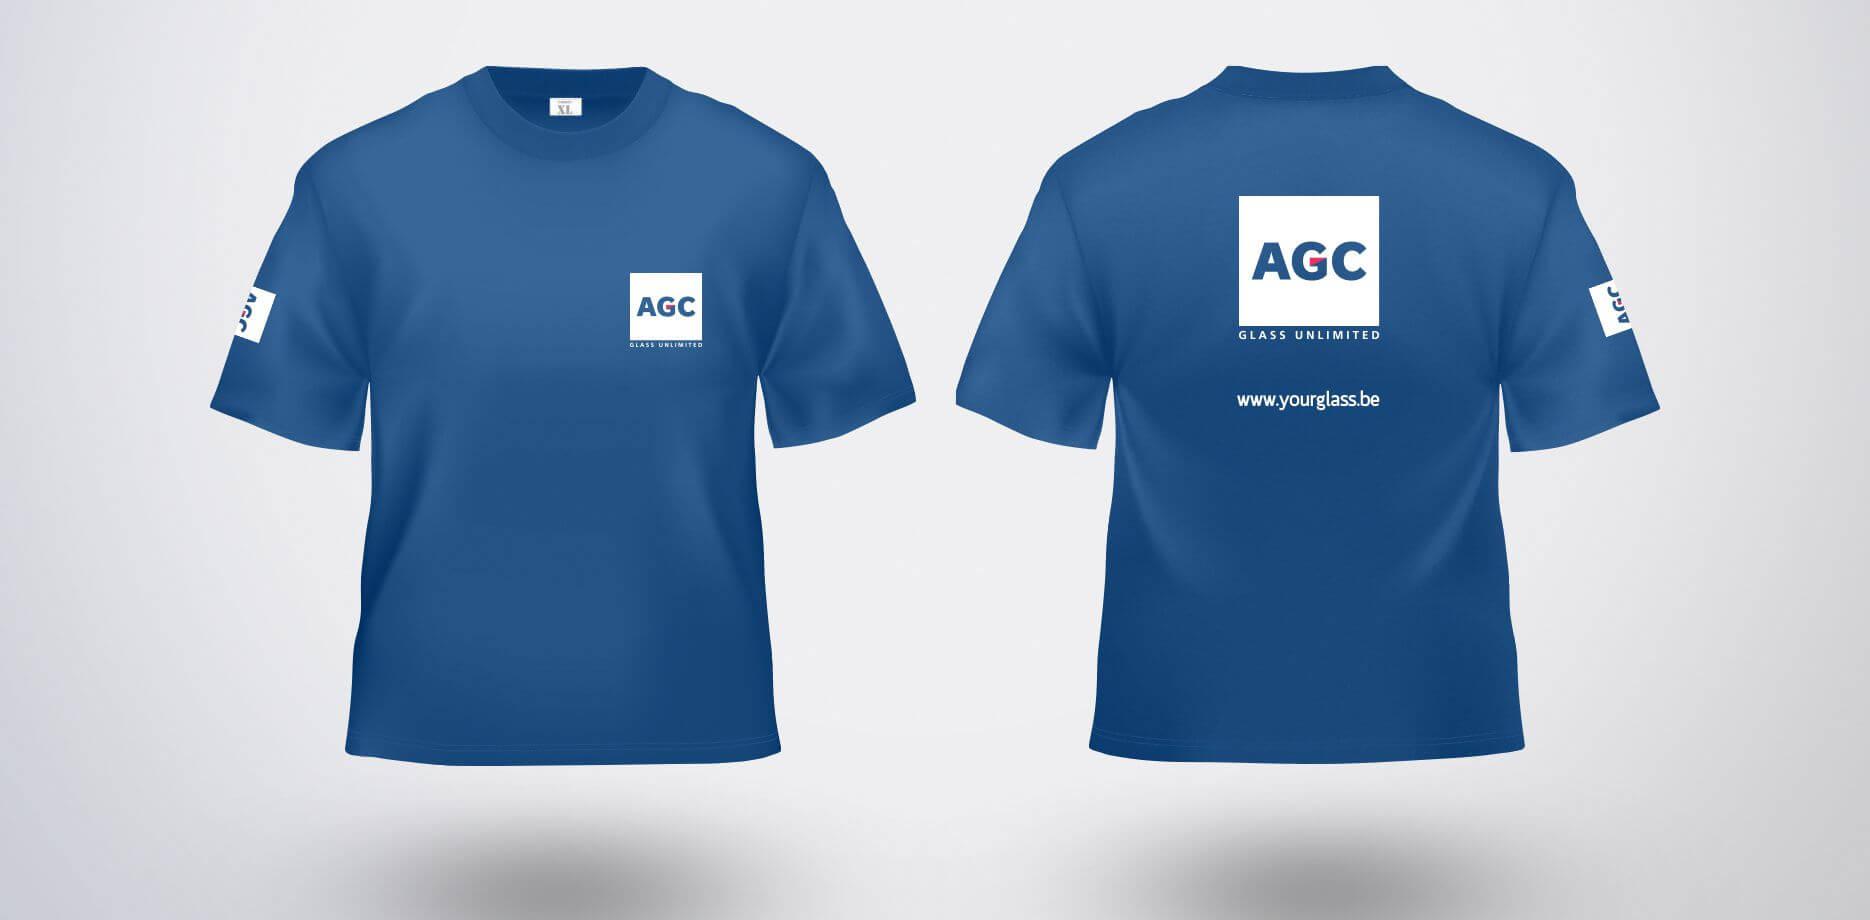 AGC T-shirts